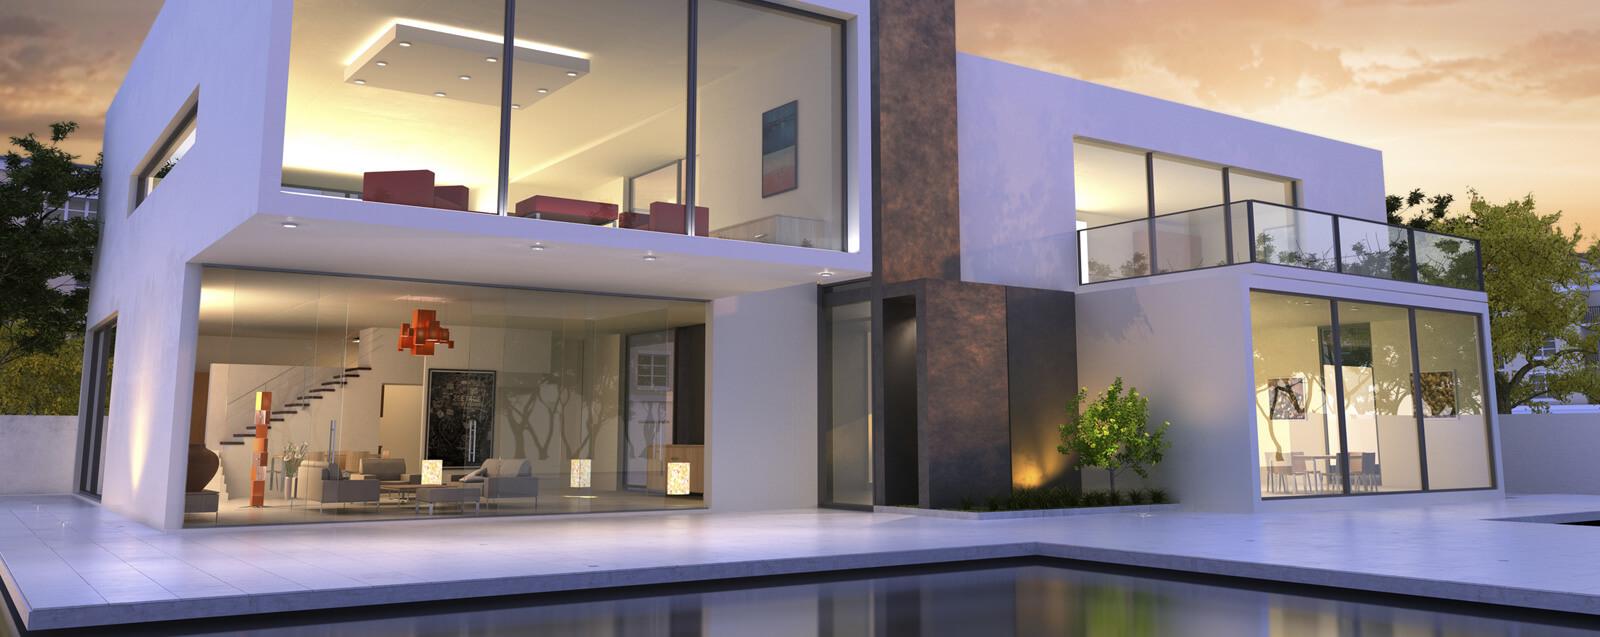 agence immobili re du pays de gex ferney voltaire. Black Bedroom Furniture Sets. Home Design Ideas